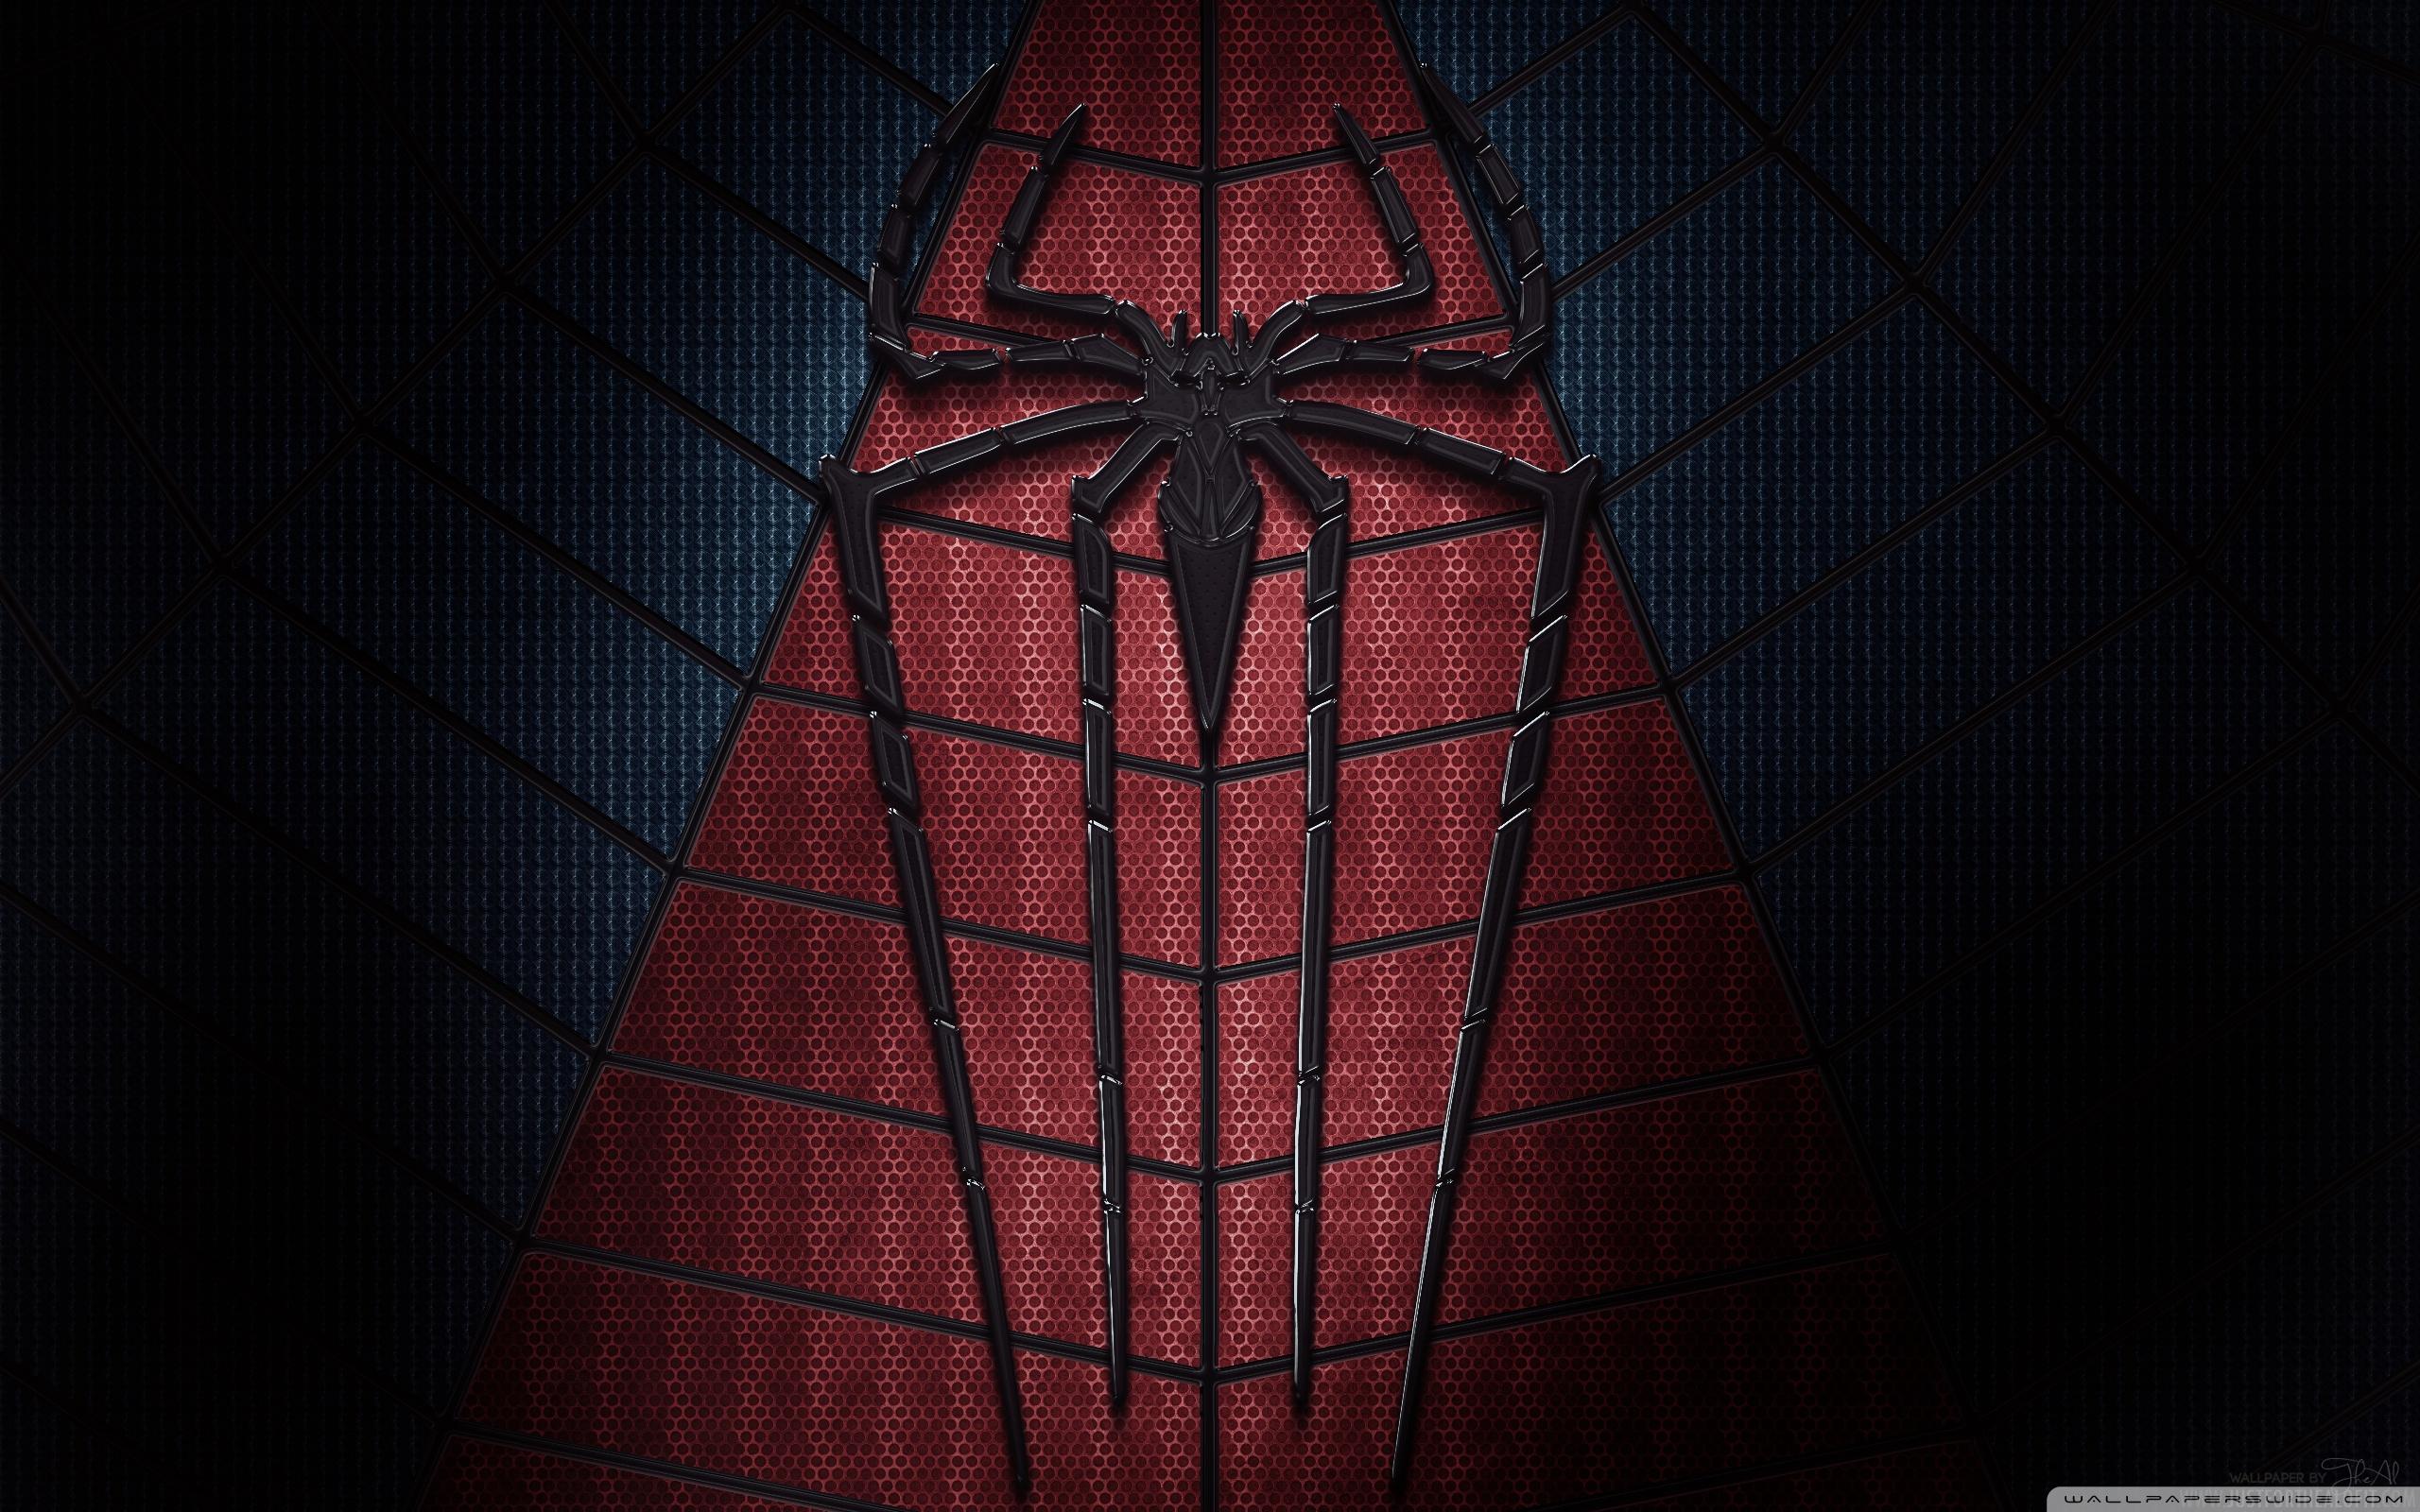 The Amazing Spider Man 2 2014 HD desktop wallpaper : High